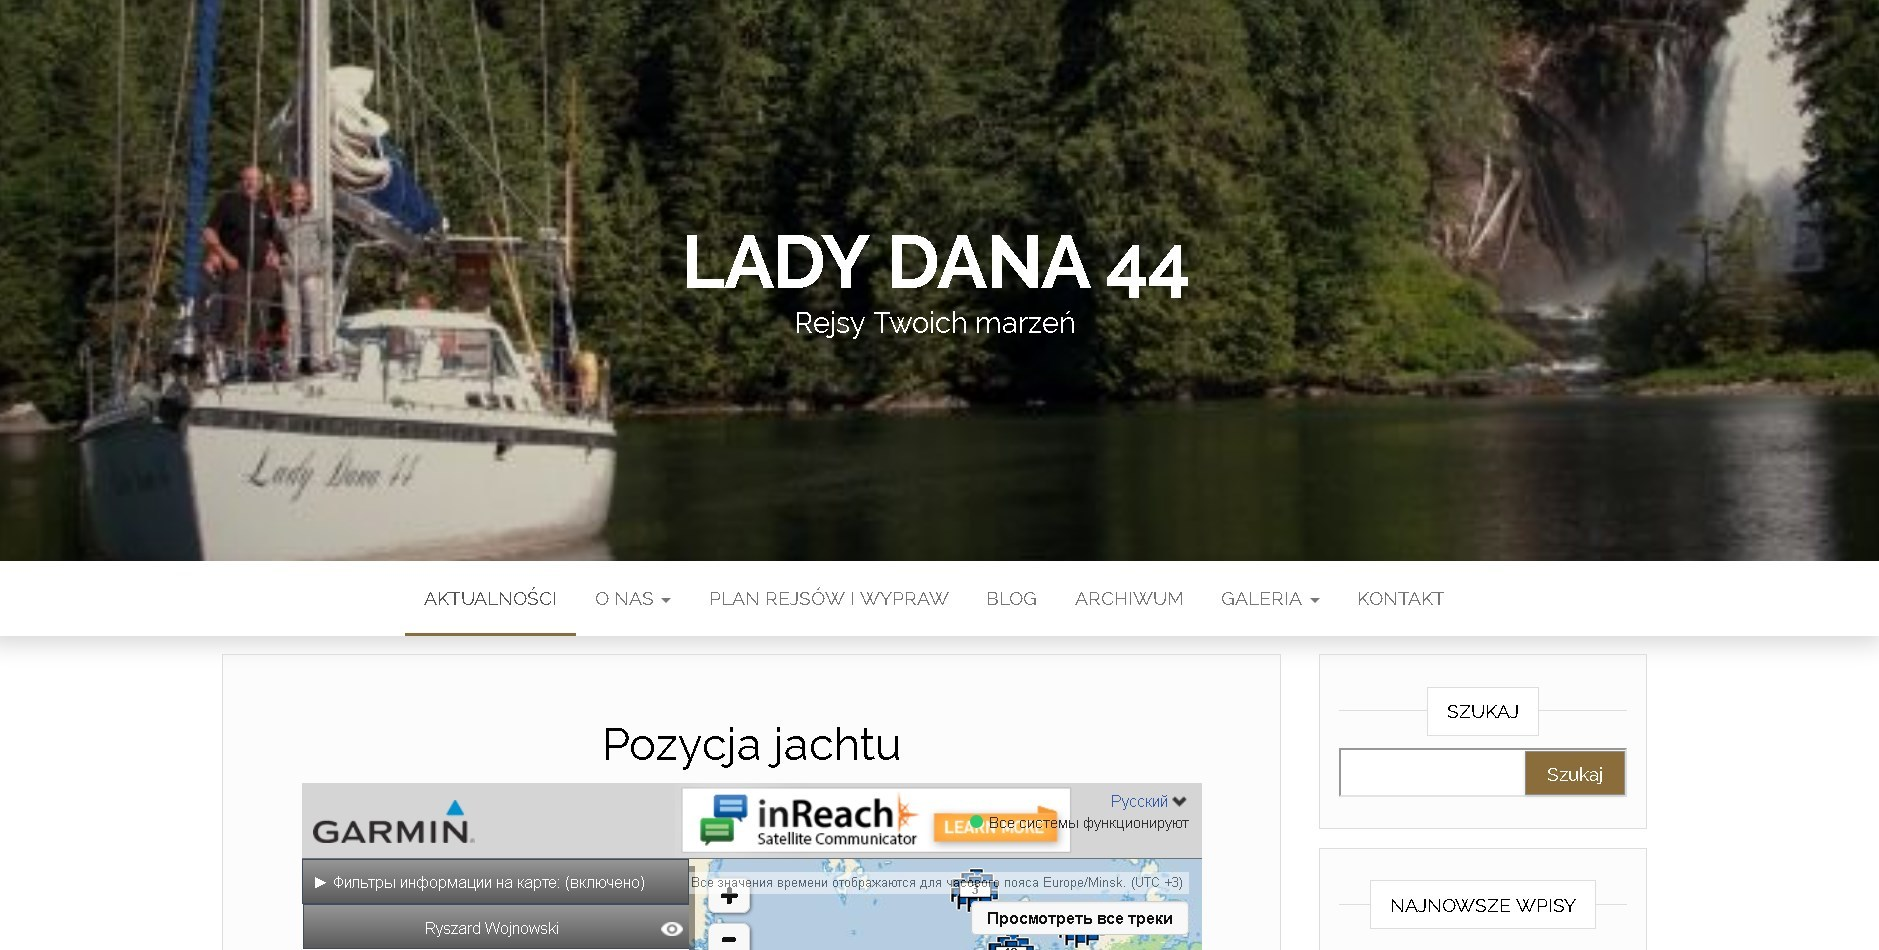 Скриншот с сайта ladydana44.pl